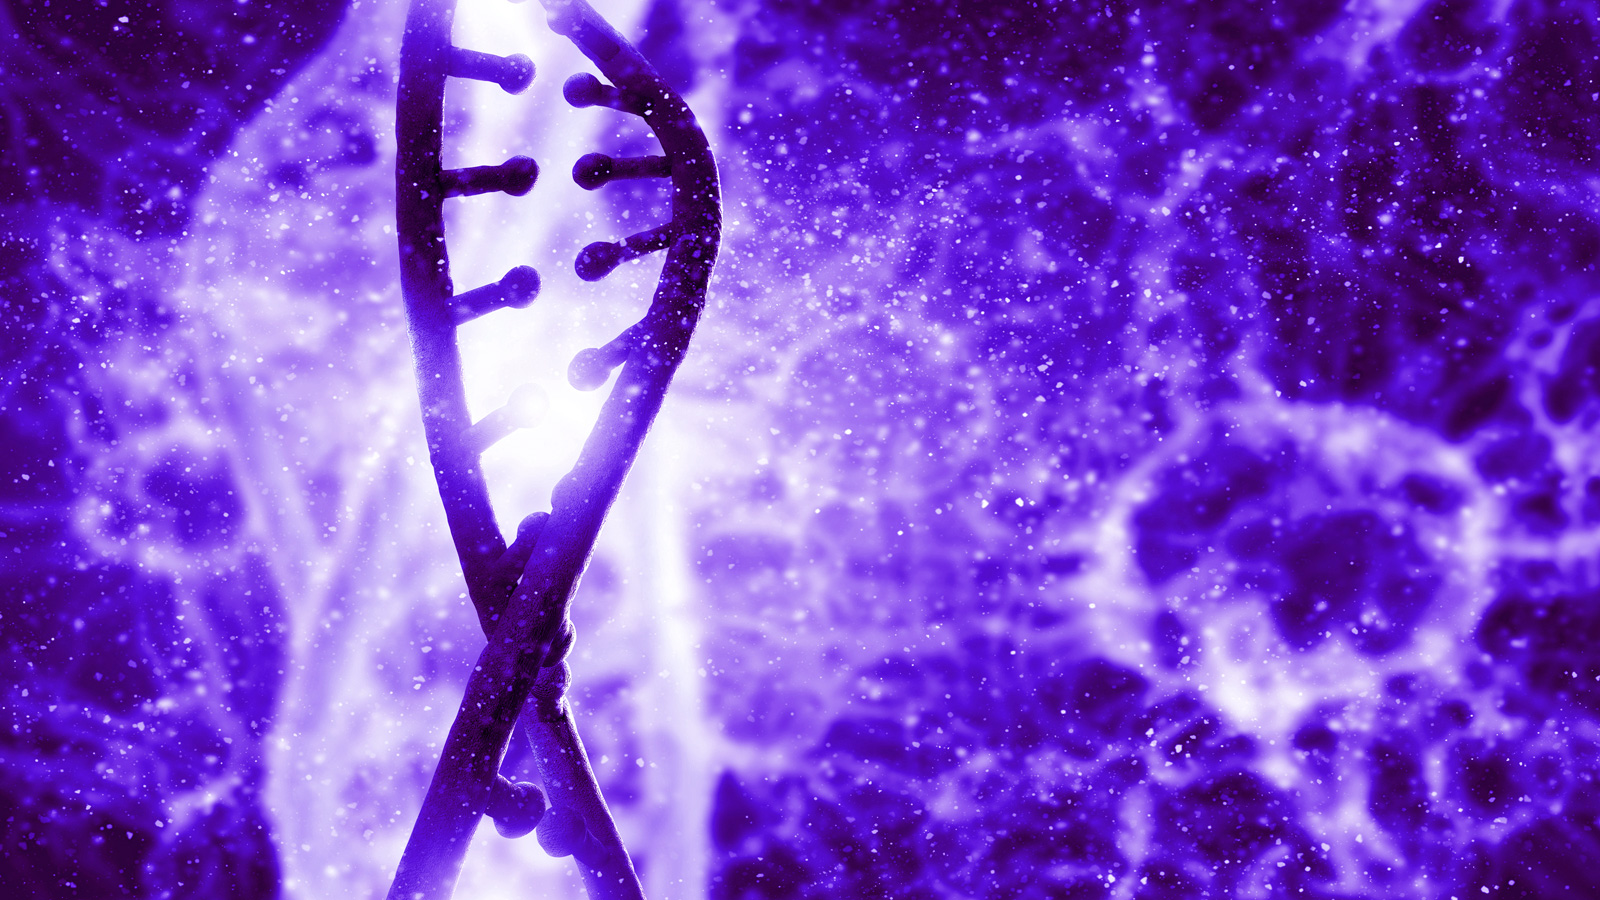 bigstock-Digital-blue-image-of-DNA-mole-990ljub